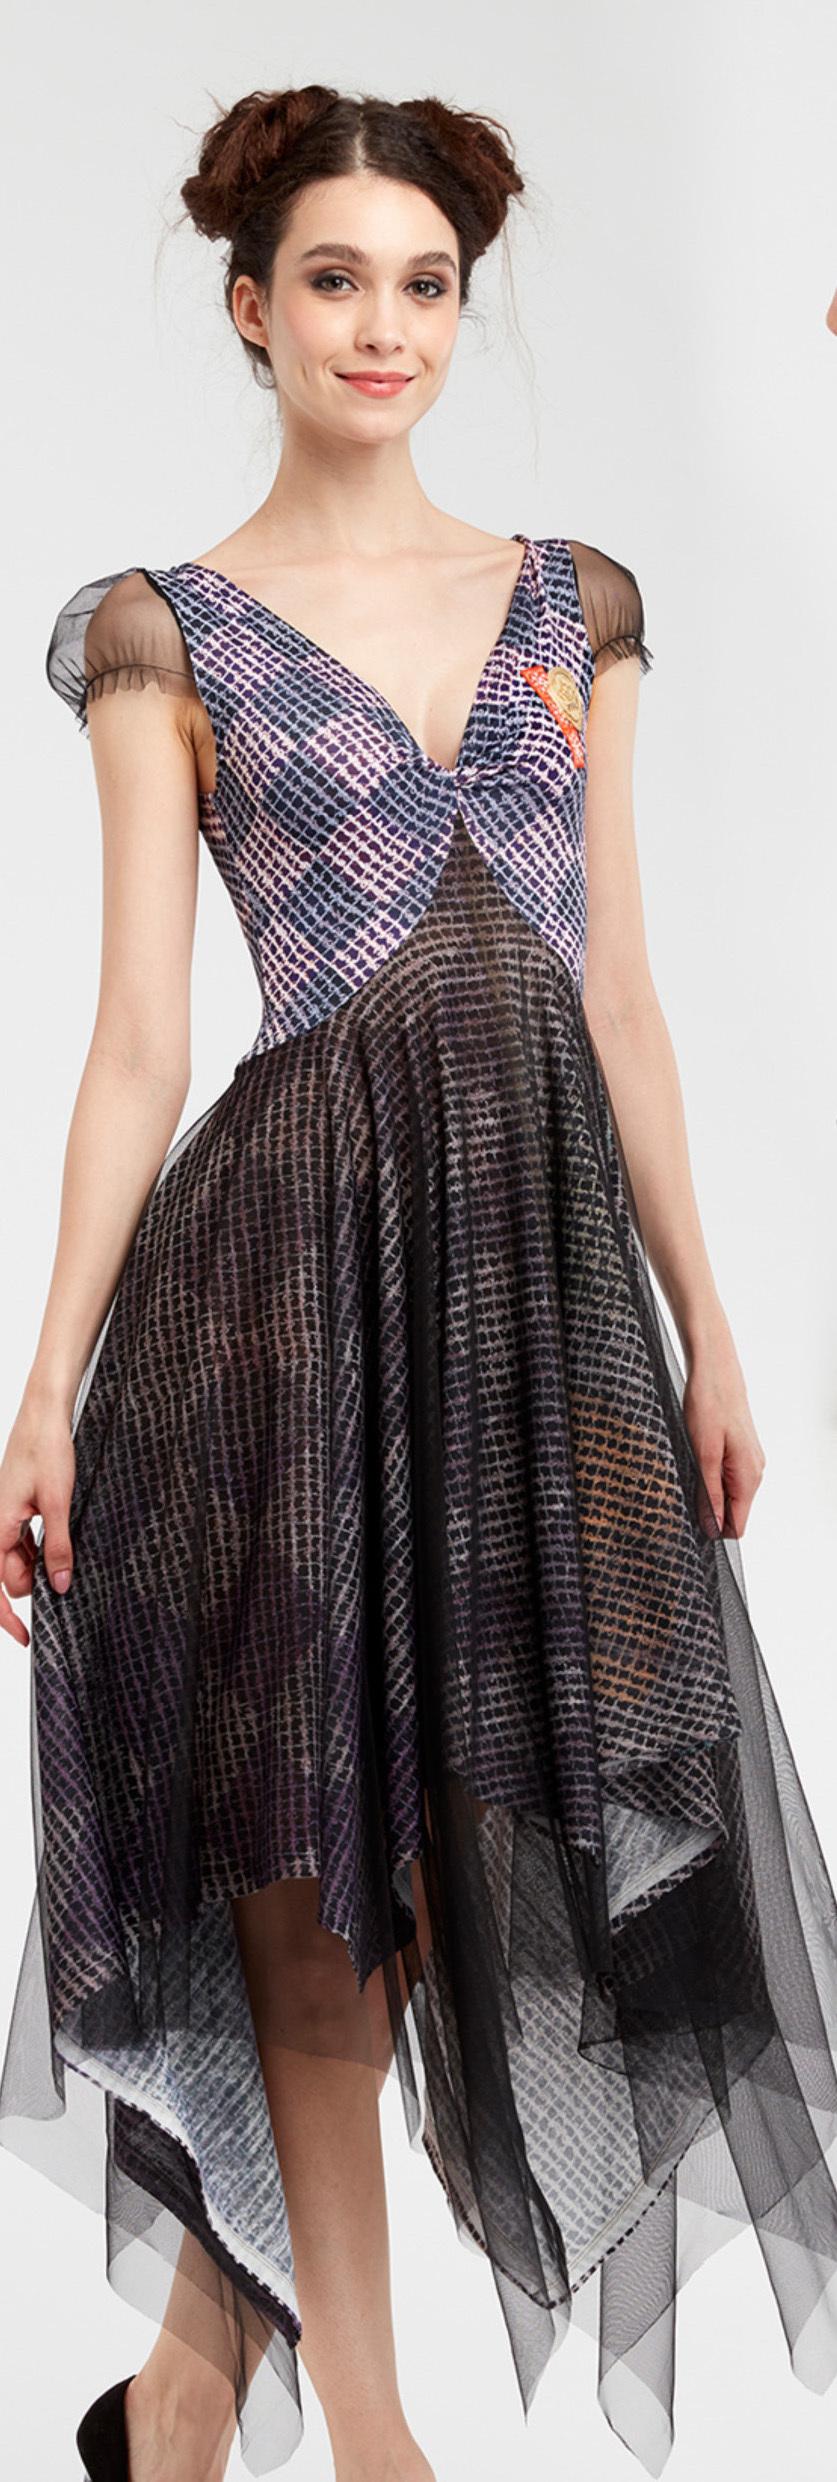 IPNG: Royal Summer Stamp Four Corners Sweetheart Midi Dress